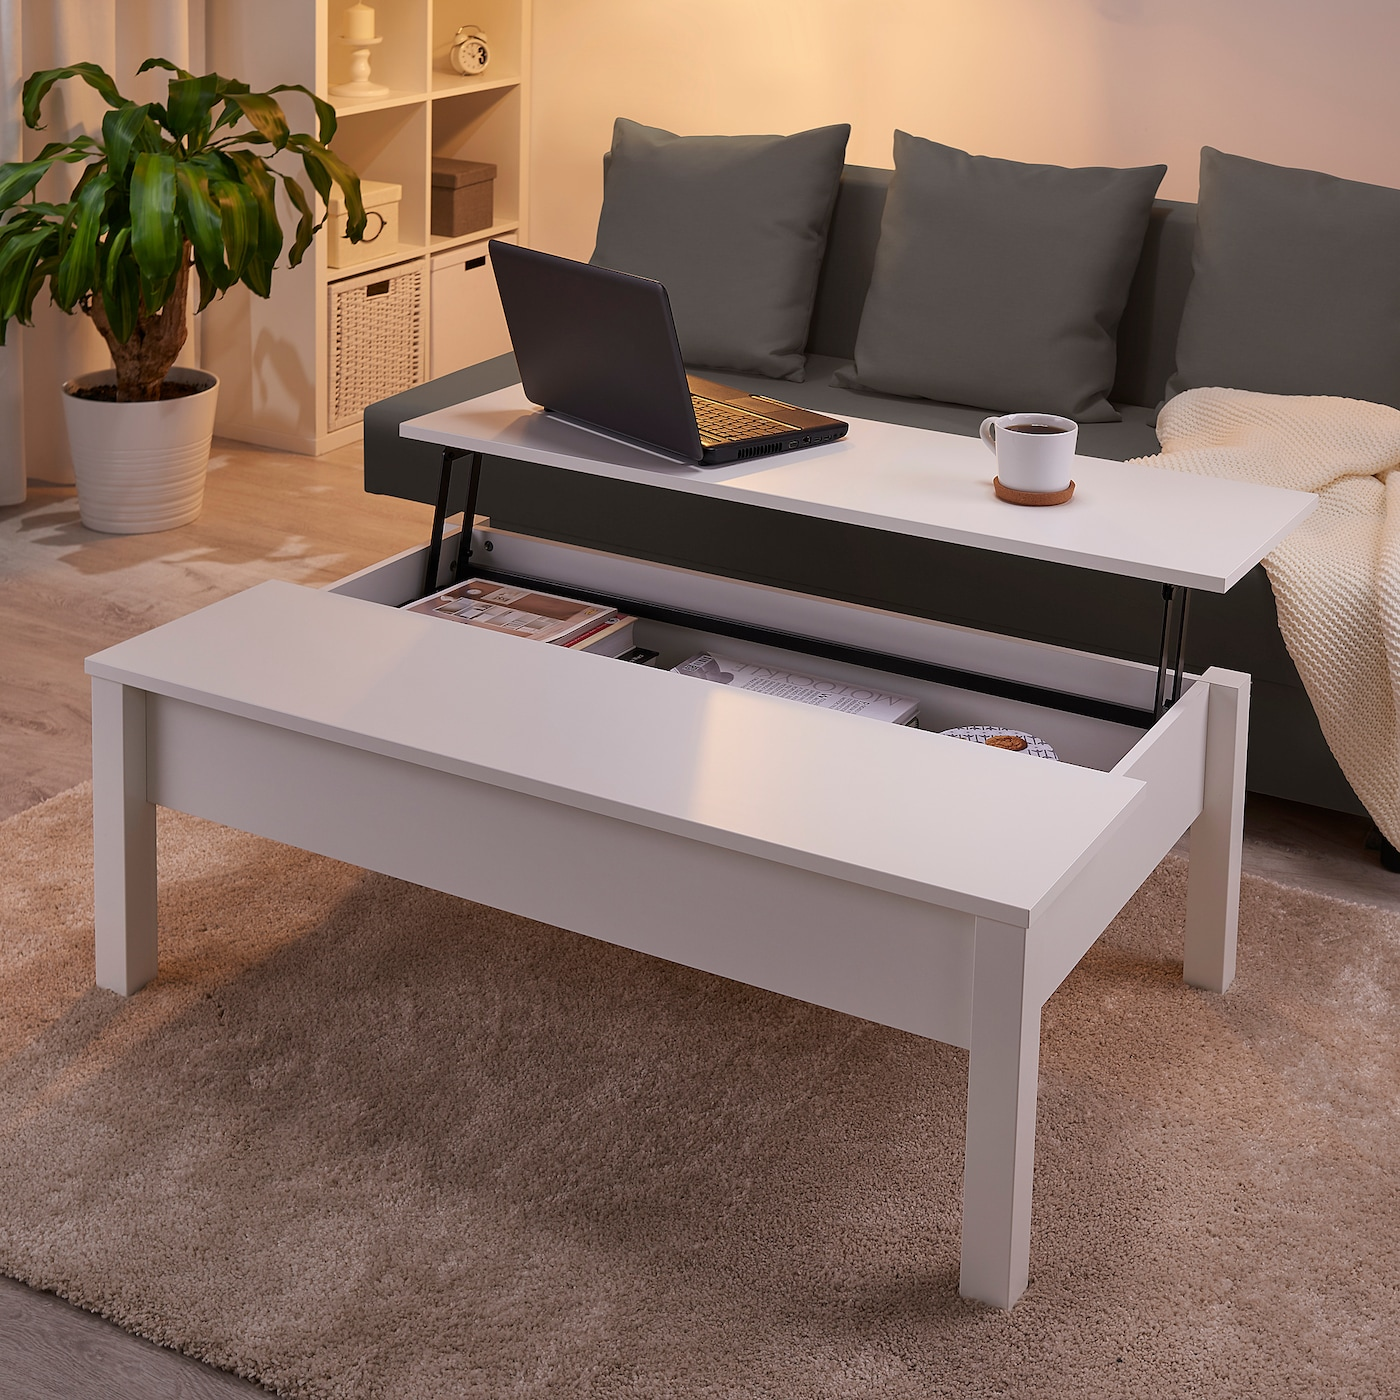 Trulstorp Coffee Table White 45 1 4x27 1 2 Ikea